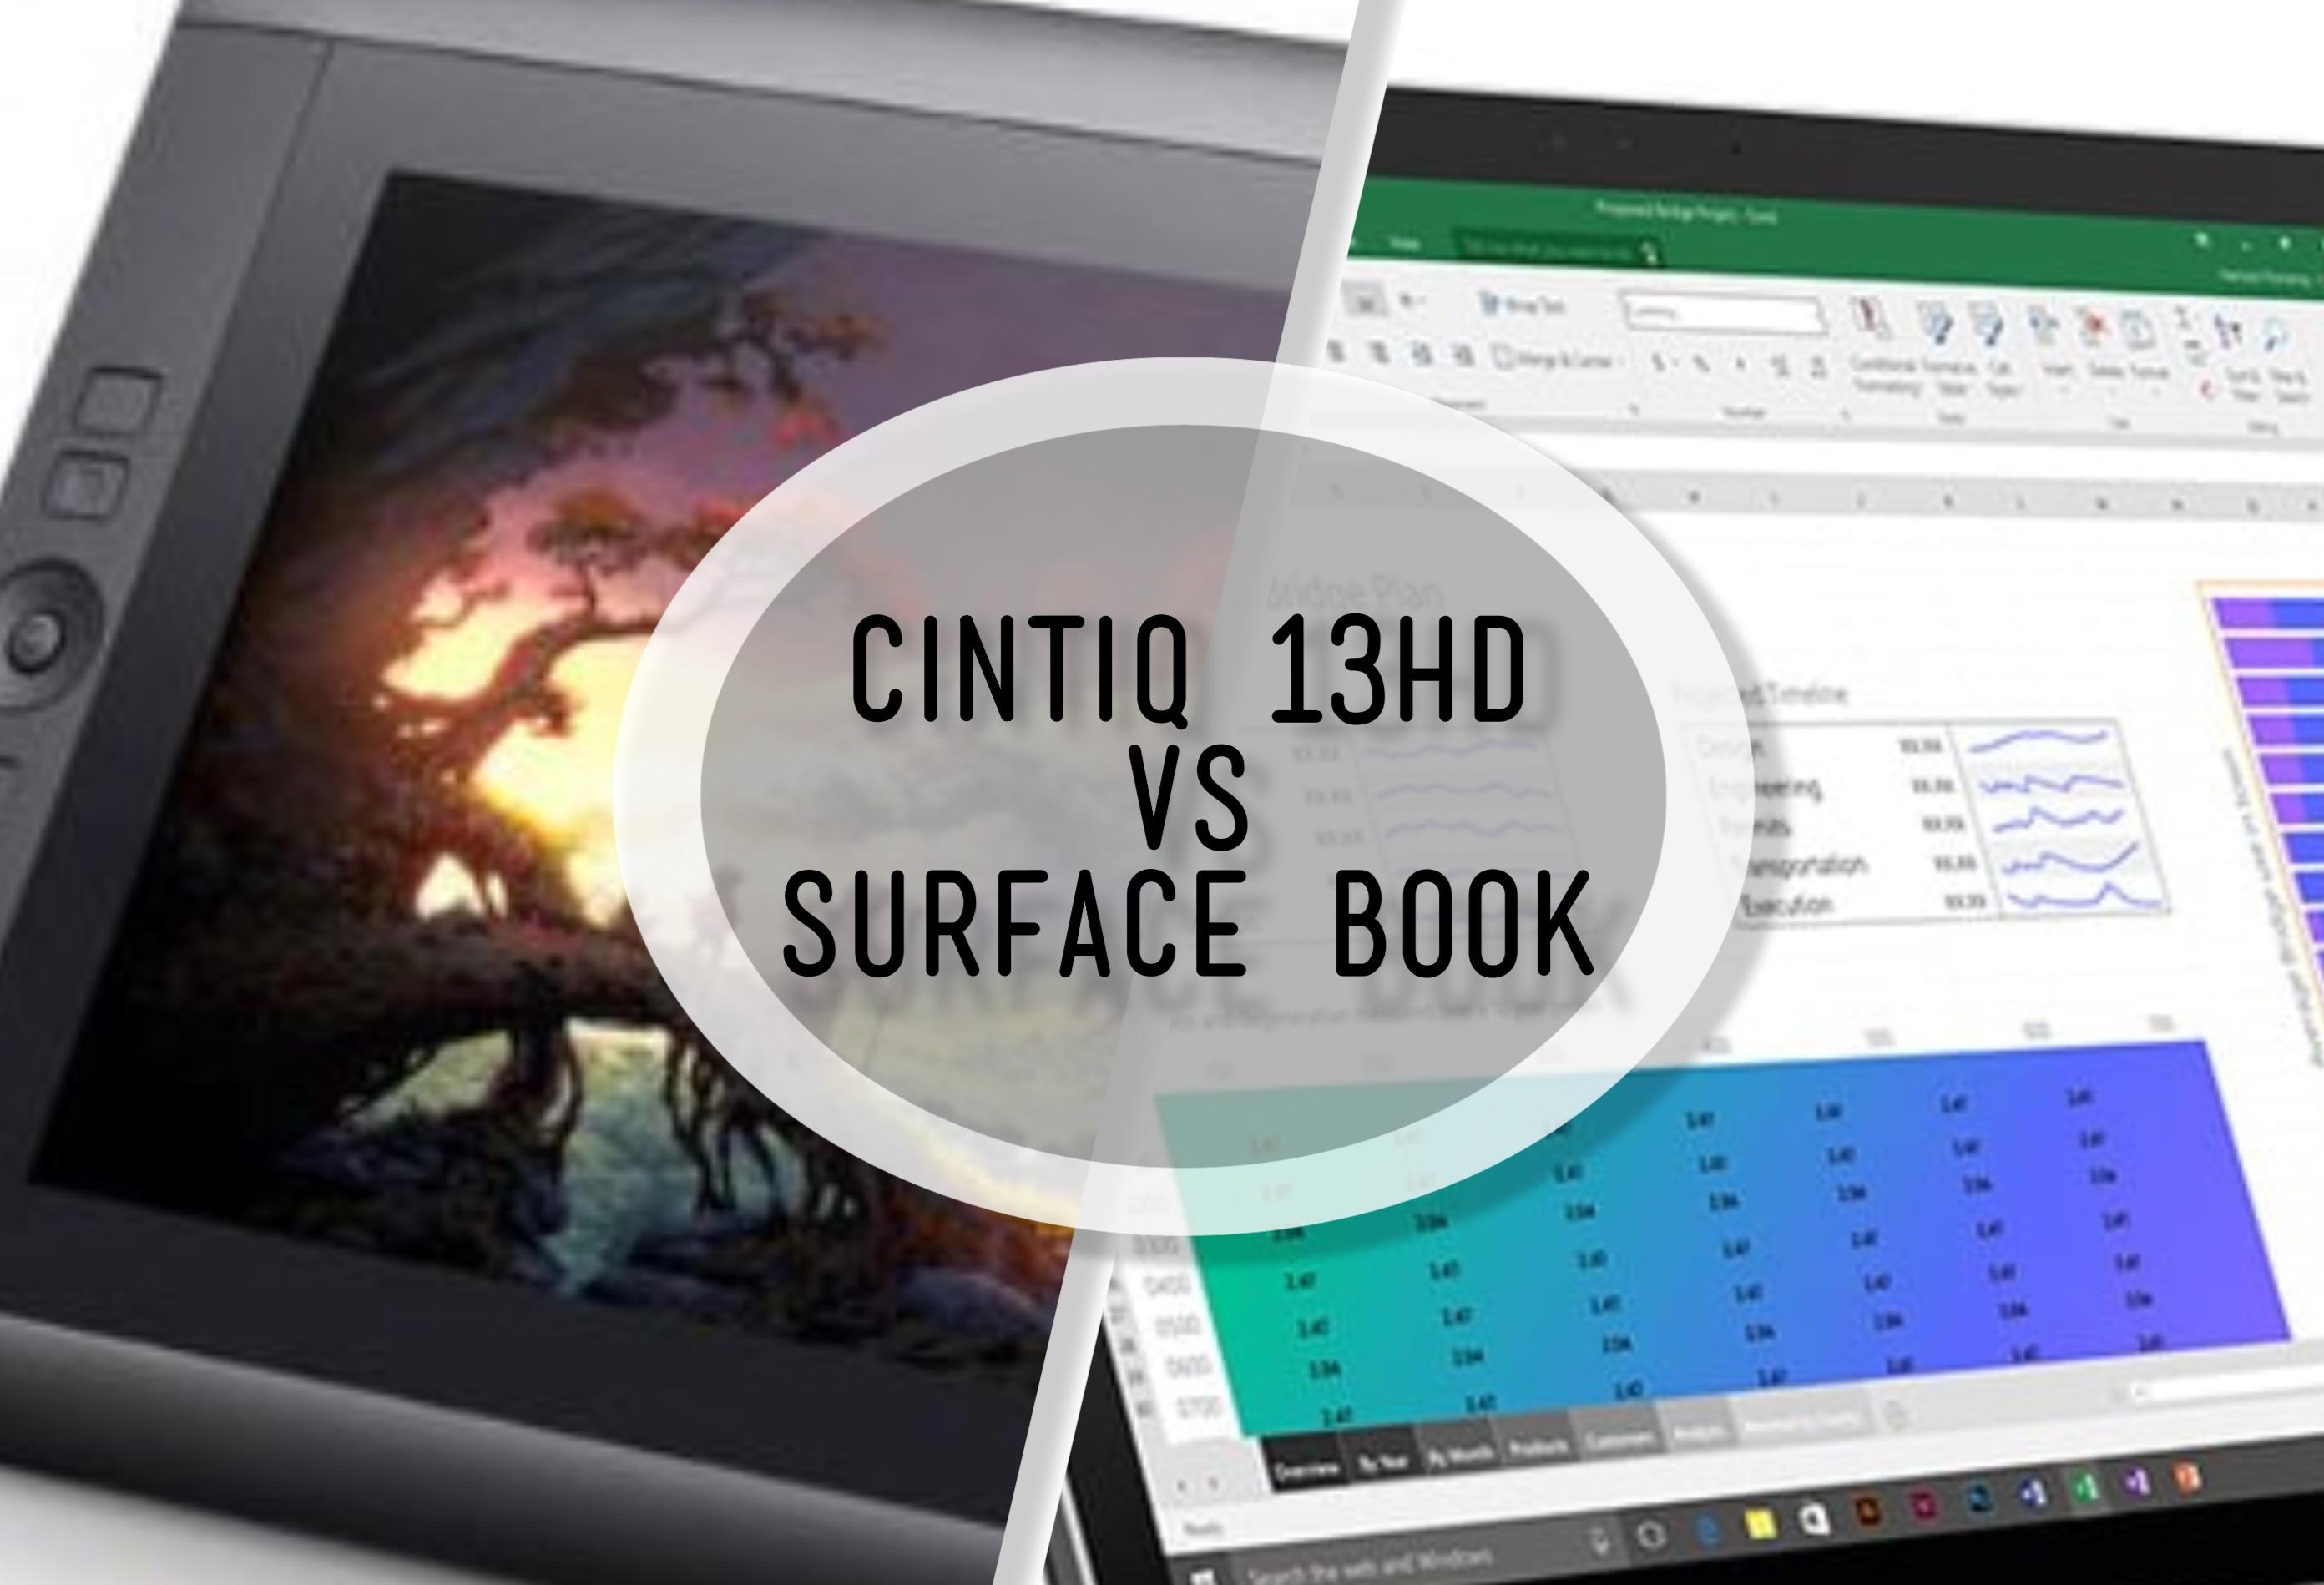 Cushty Surface Book Vs Wacom Cintiq A Viable Stuff Wacom Cintiq 13hd Driver Mac Wacom Cintiq 13hd Tablet Driver Is Not Responding dpreview Wacom Cintiq 13hd Driver